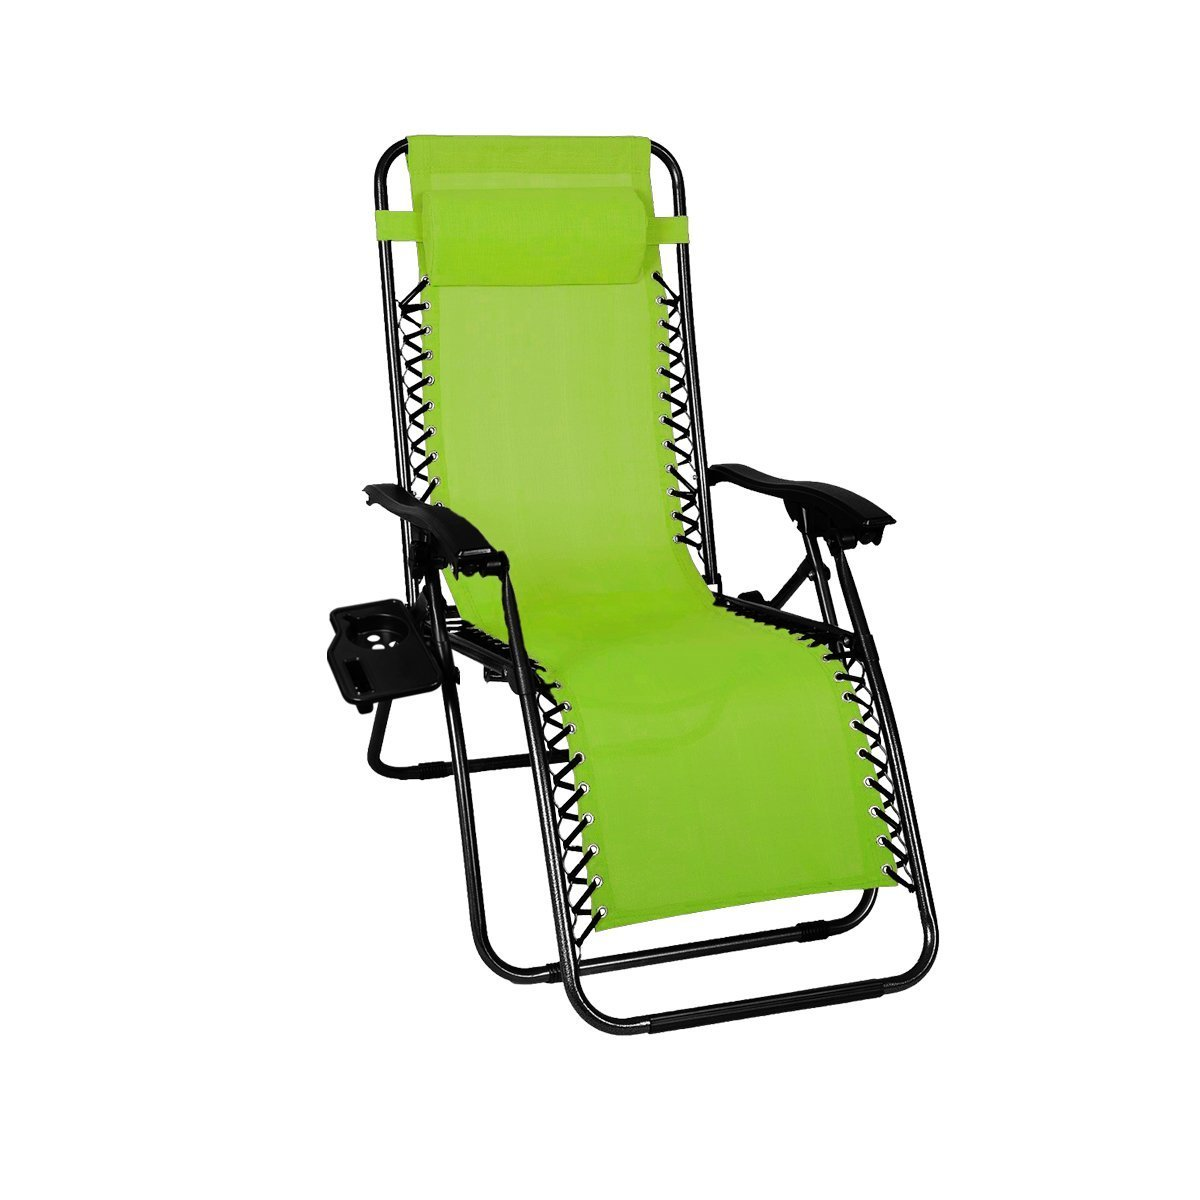 Buy Odaof Zero Gravity Recliner Outdoor Patio Lounge Chair